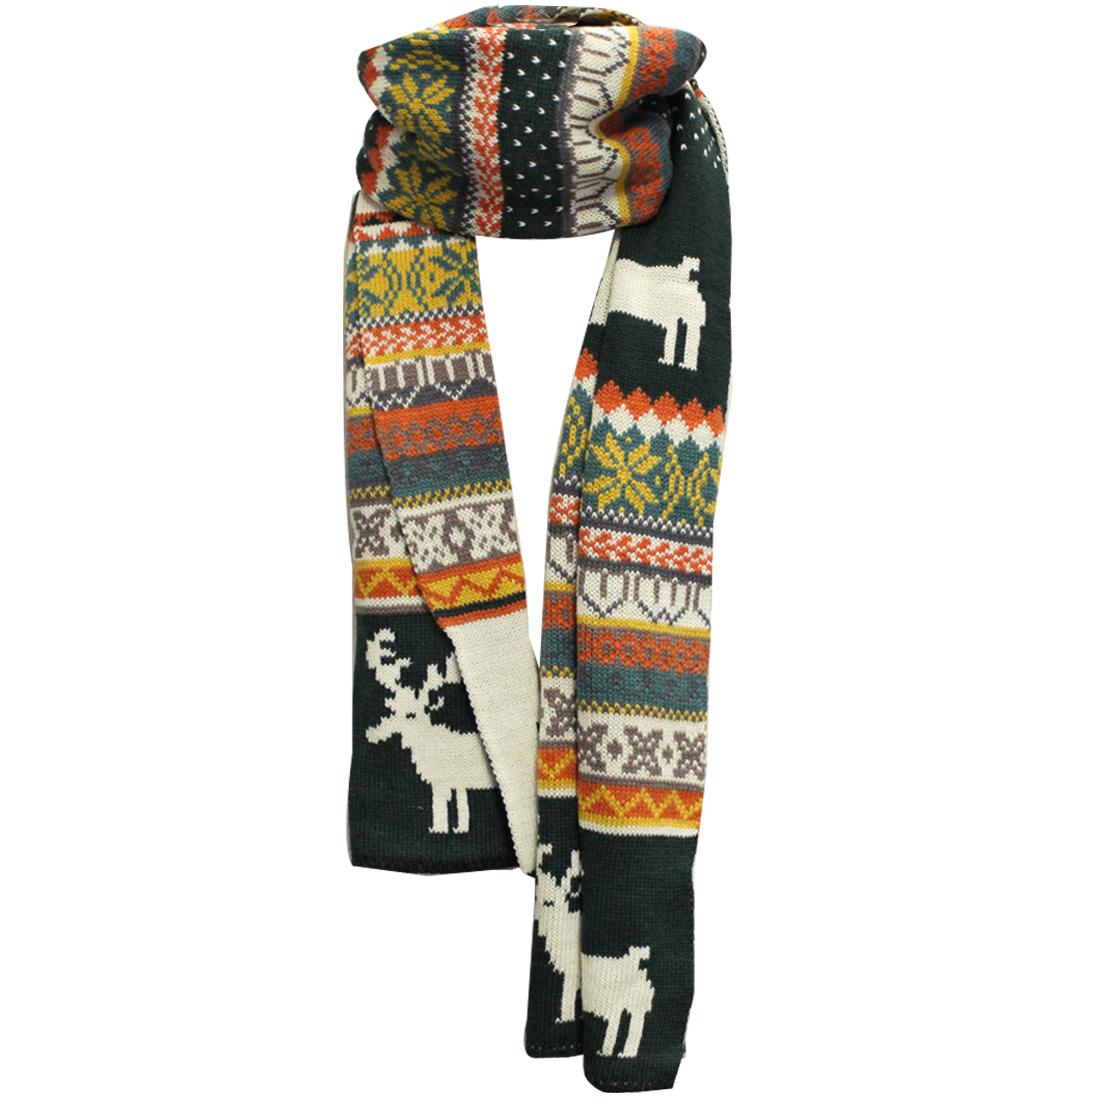 Mens Dark Green White Ethnic Style Long Shawl Wrap Knitting Scarf